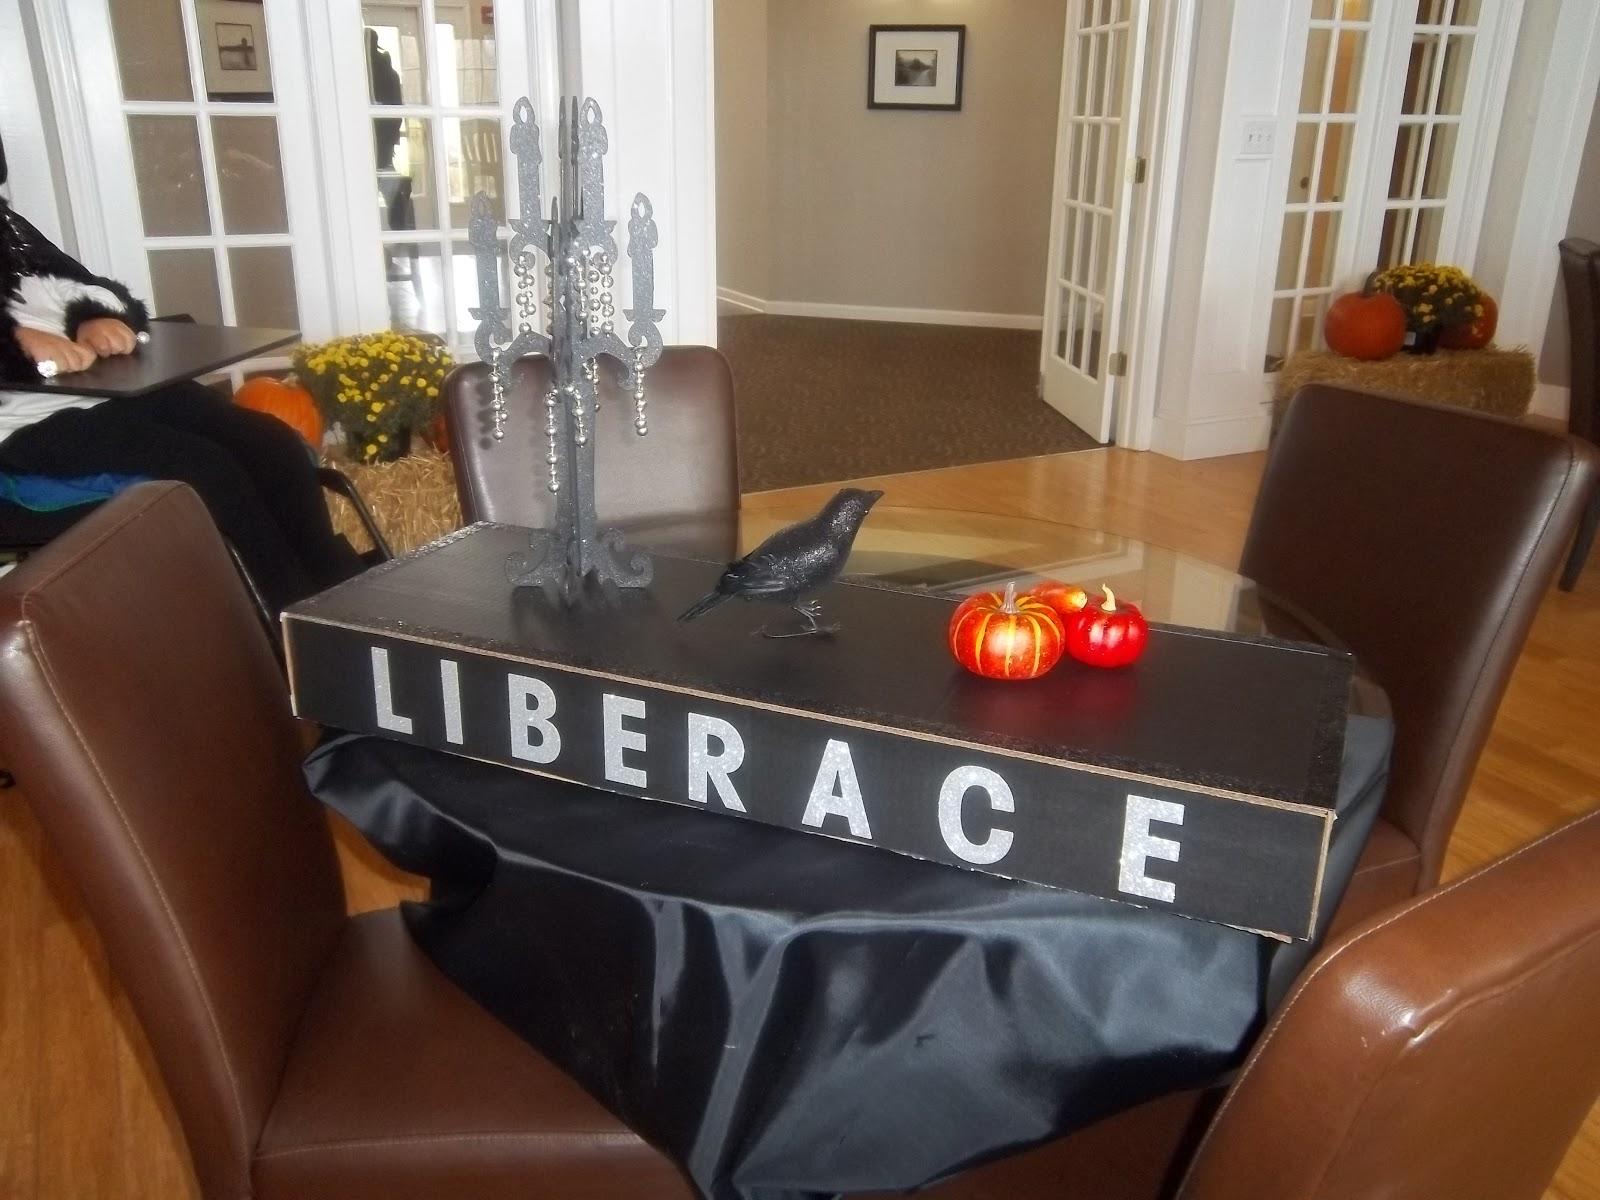 Dream Mom Liberace Wheelchair Halloween Costume 2012